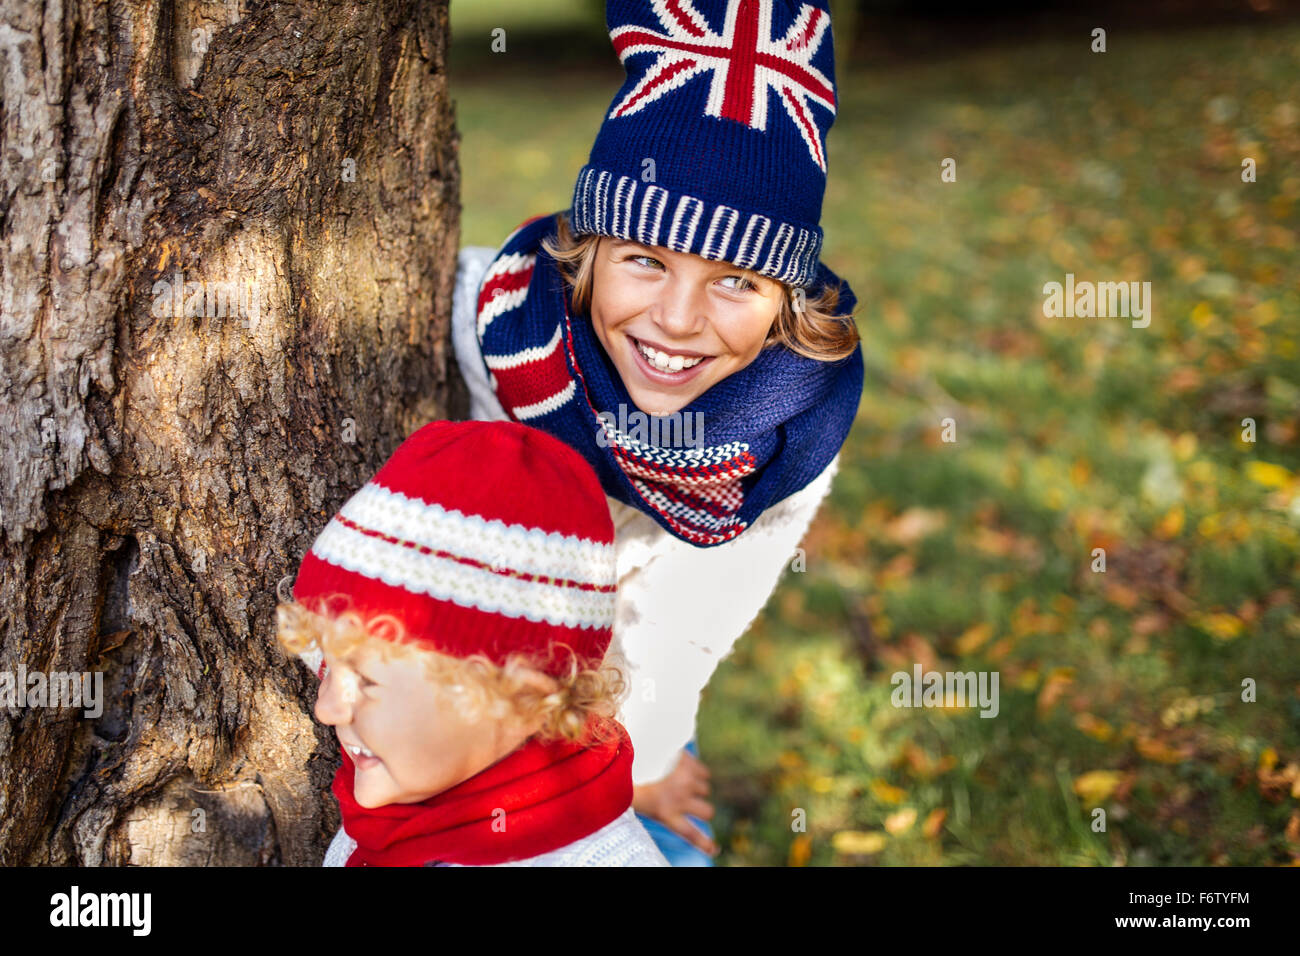 Portrait of two blond boys wearing fashionable knit wear in autumn - Stock Image